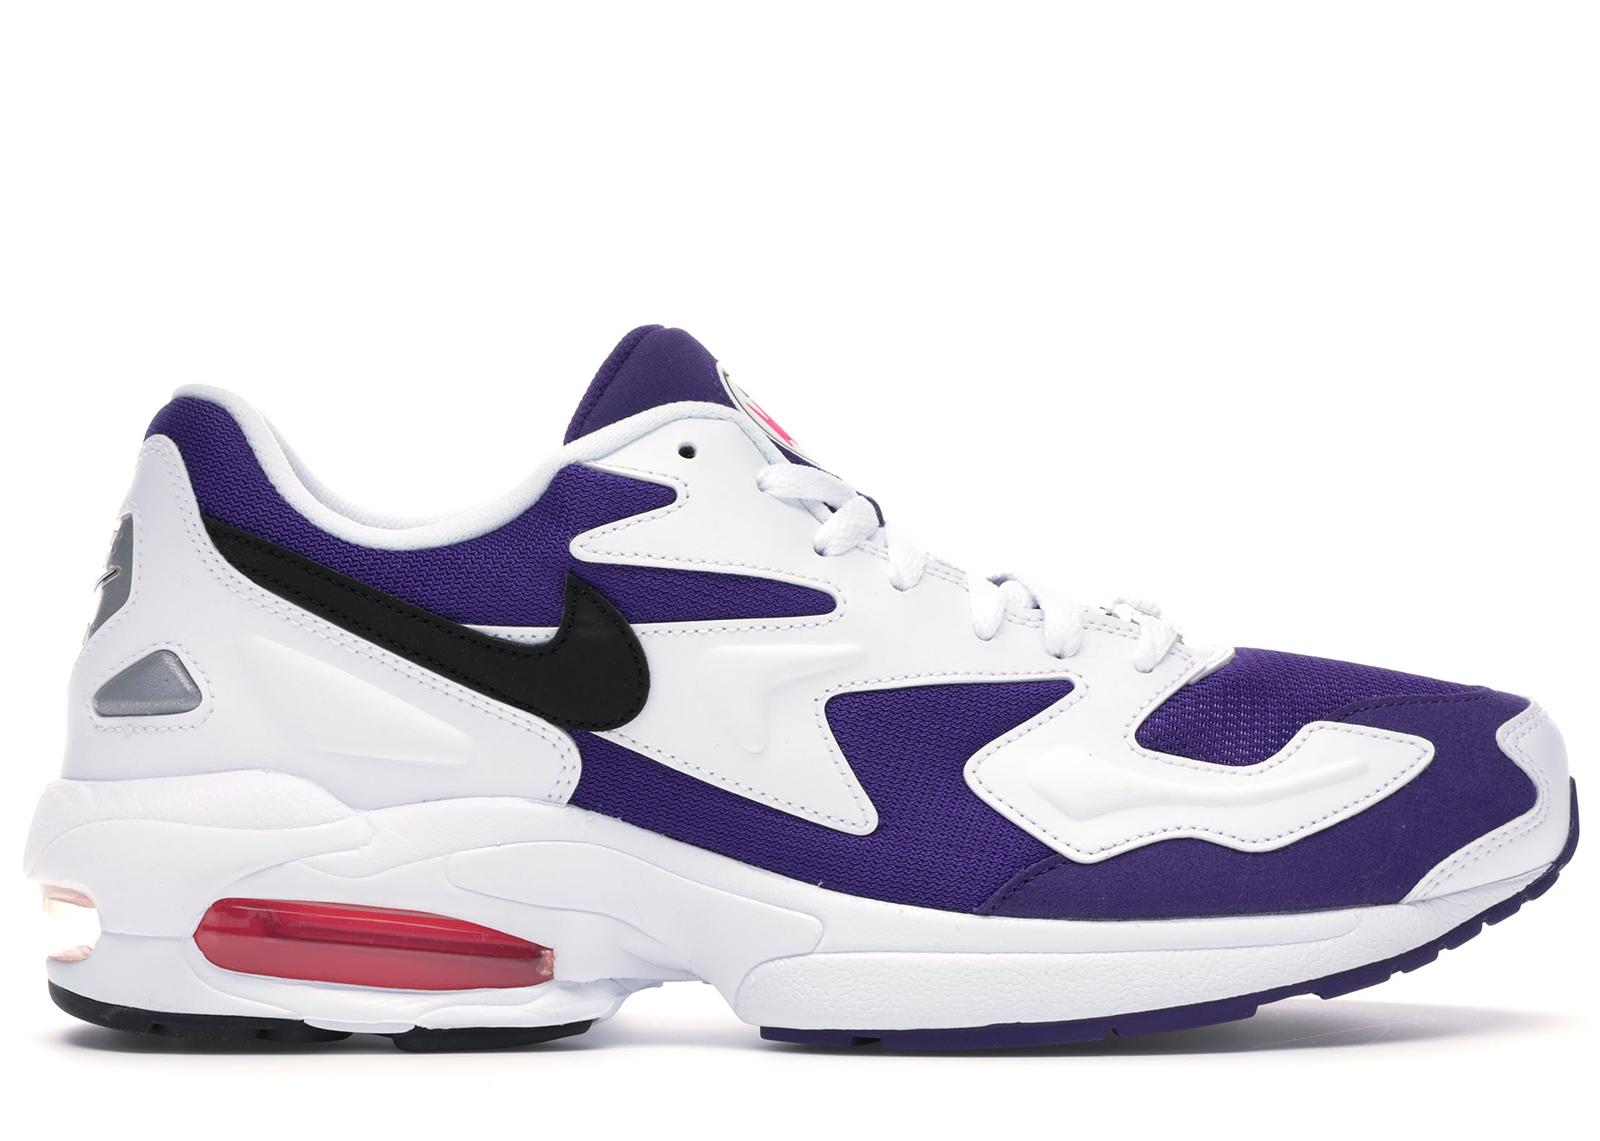 Nike Air Max2 Light White Purple Pink